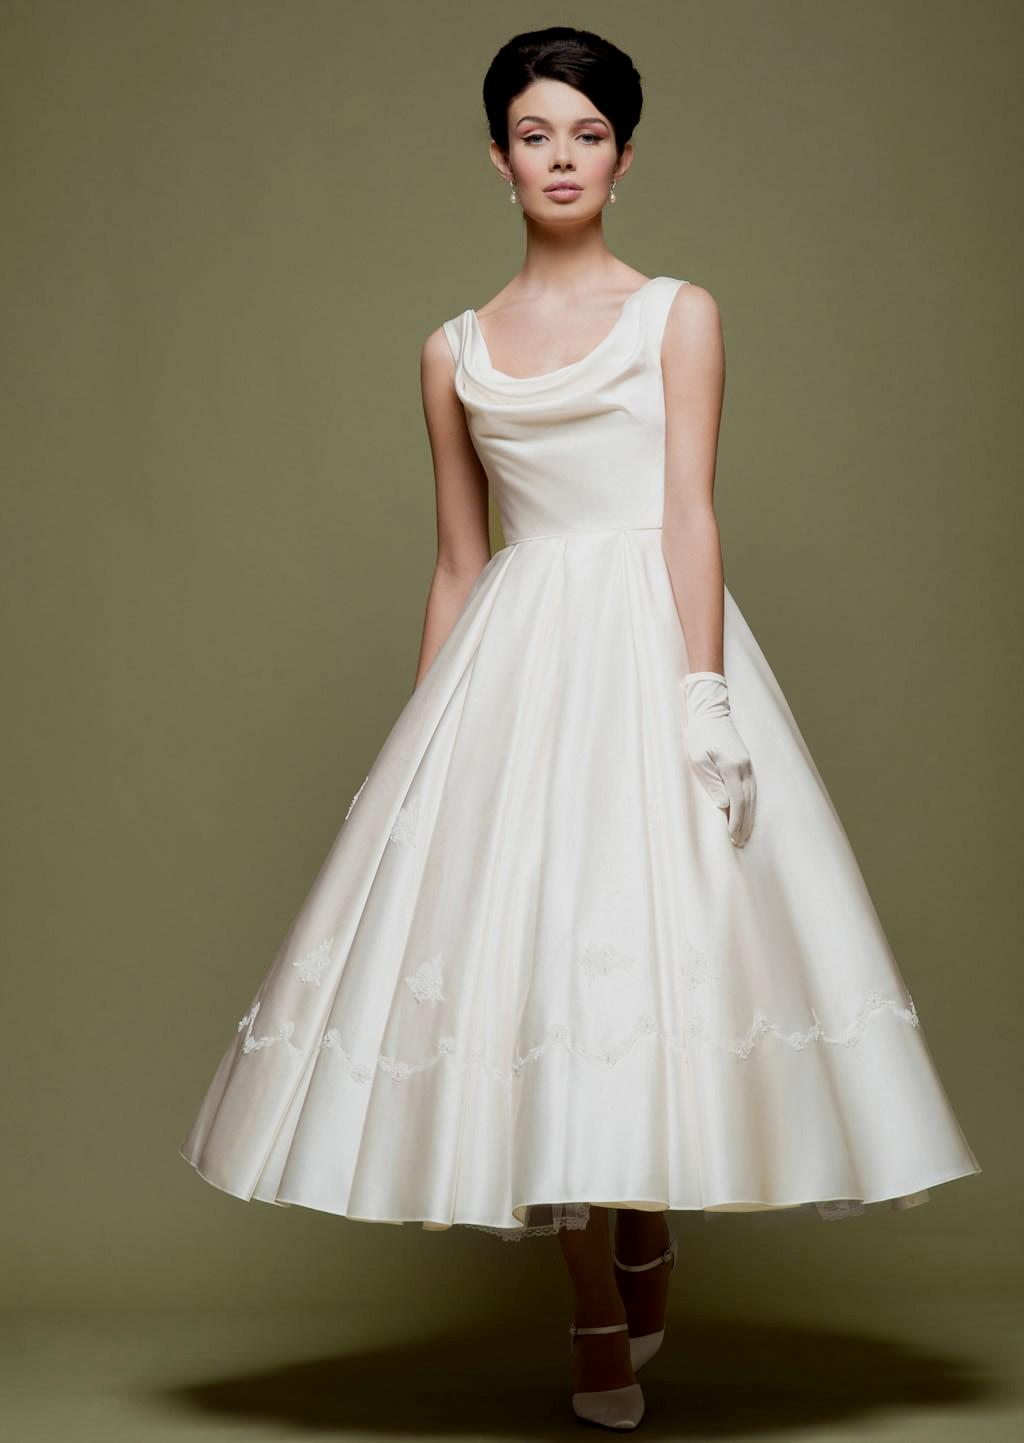 50s inspired wedding dresses photo - 1